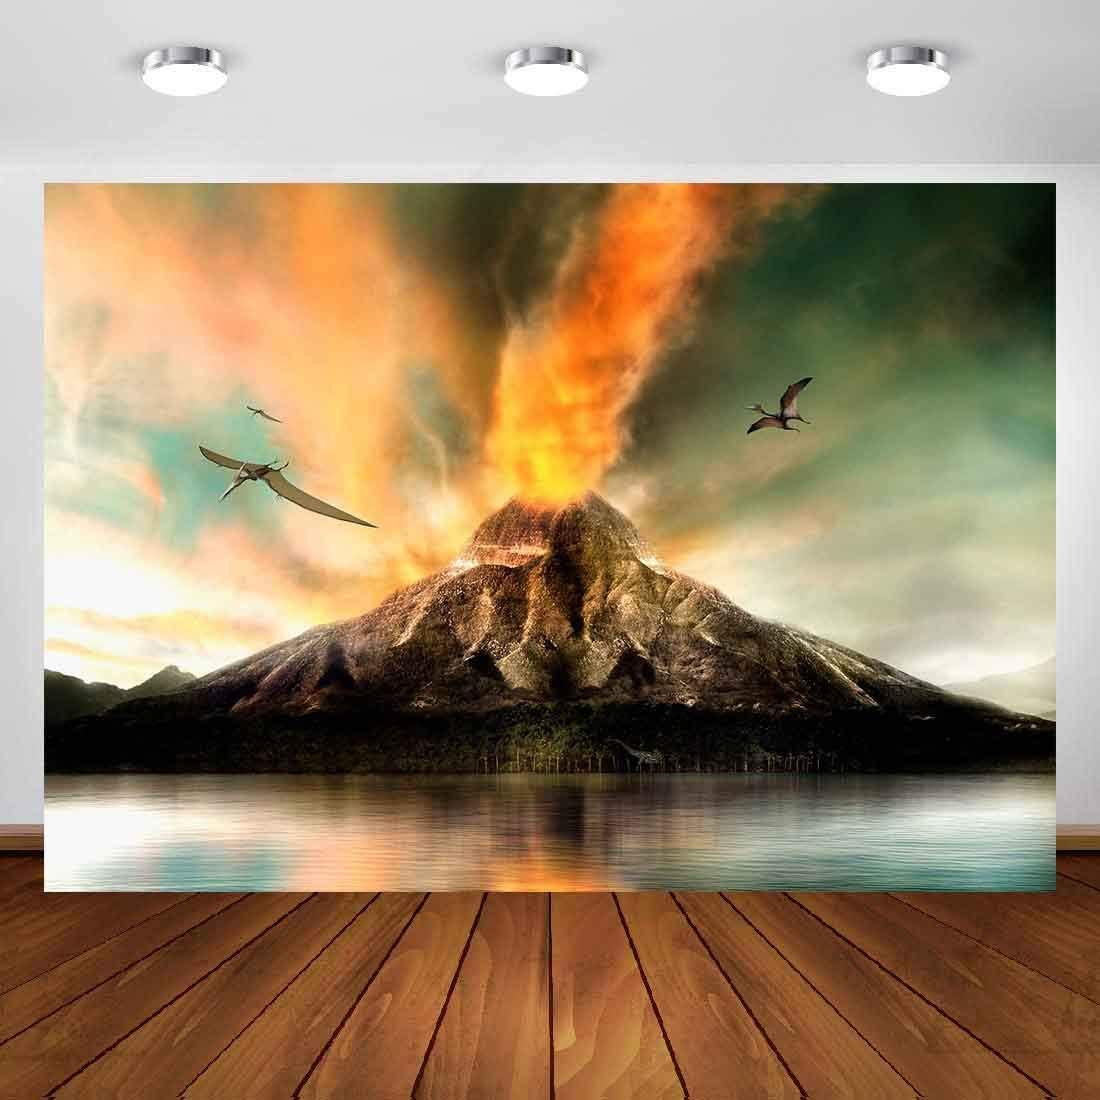 SZZWY 7x5ft Volcano Backdrop Volcano Eruption Nature Photography Backdrop Photo Studio Background Props LYP079